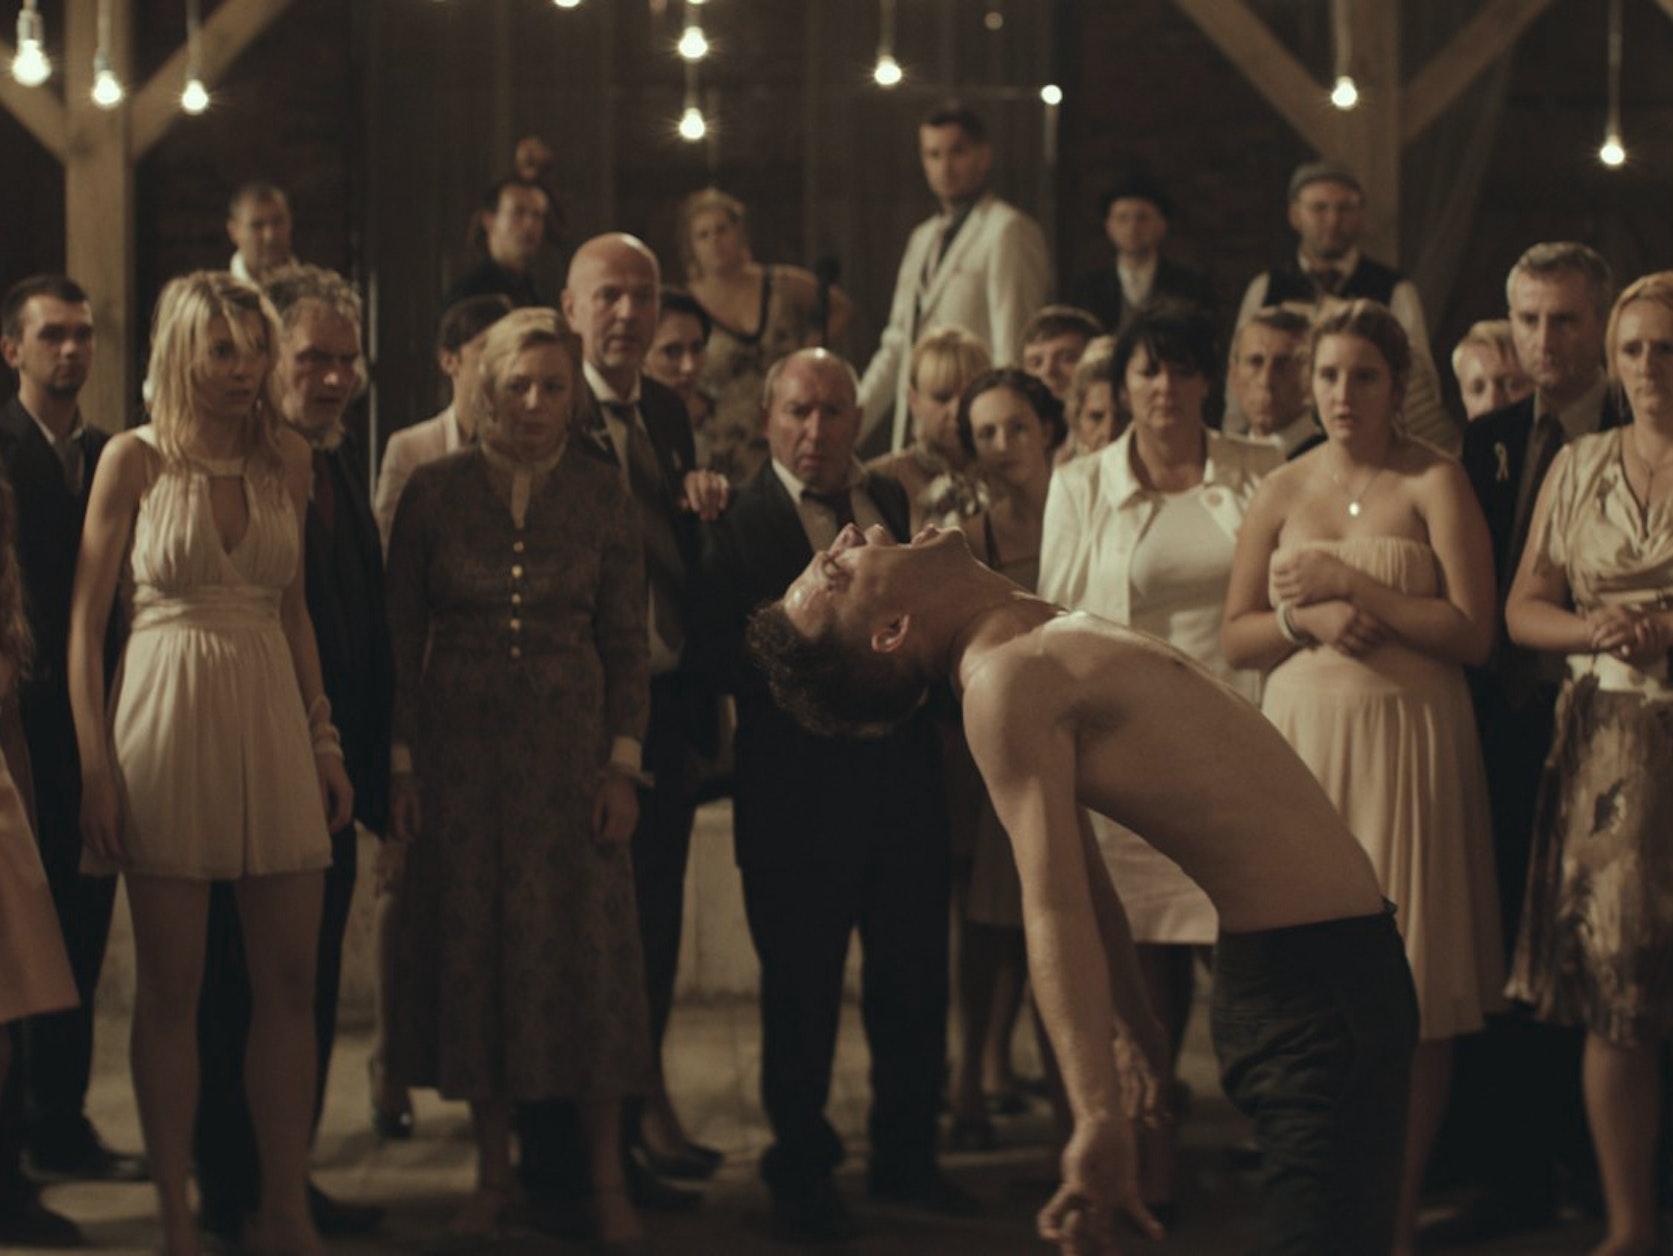 Polish Jewish Horror Film 'Demon' Has a Dark, Mysterious Backstory